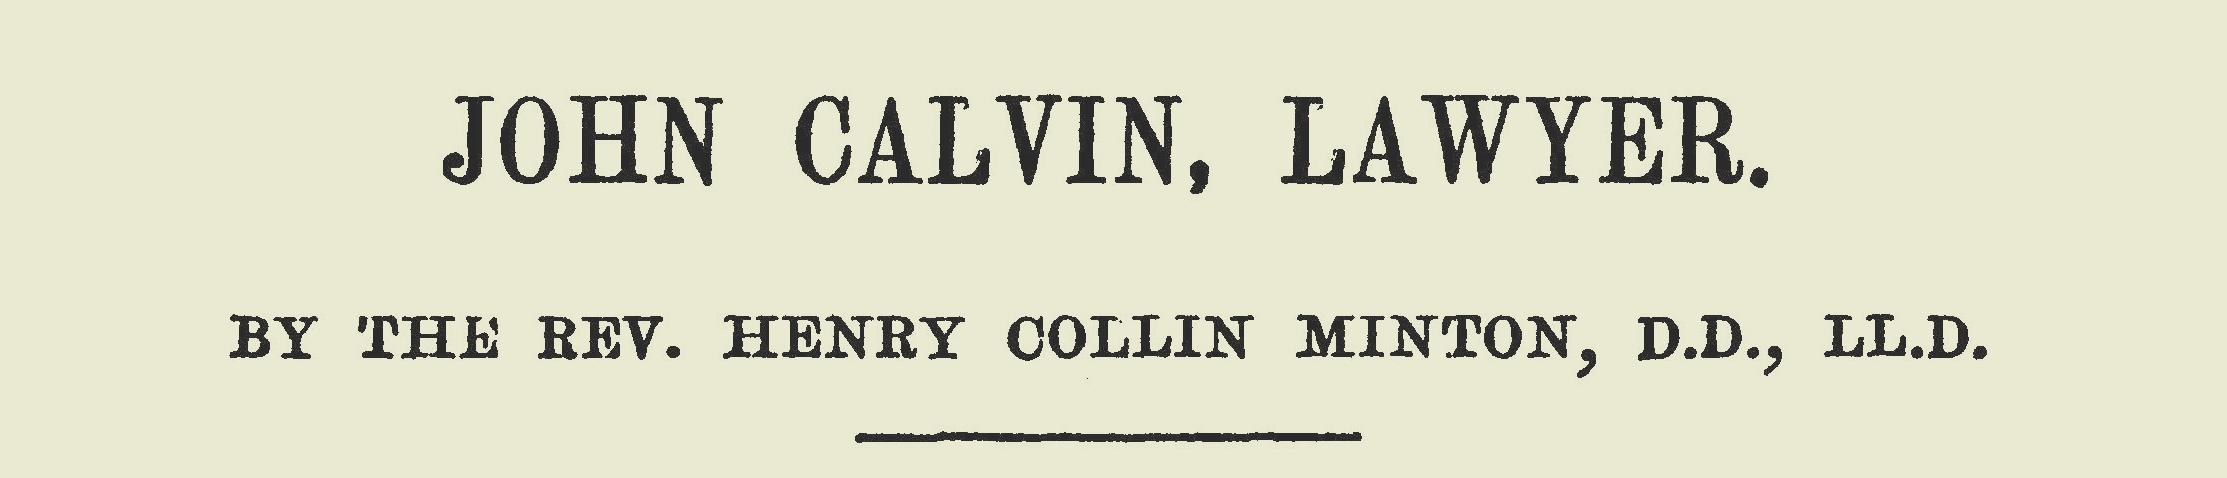 Minton, Henry Collin, John Calvin, Lawyer Title Page.jpg